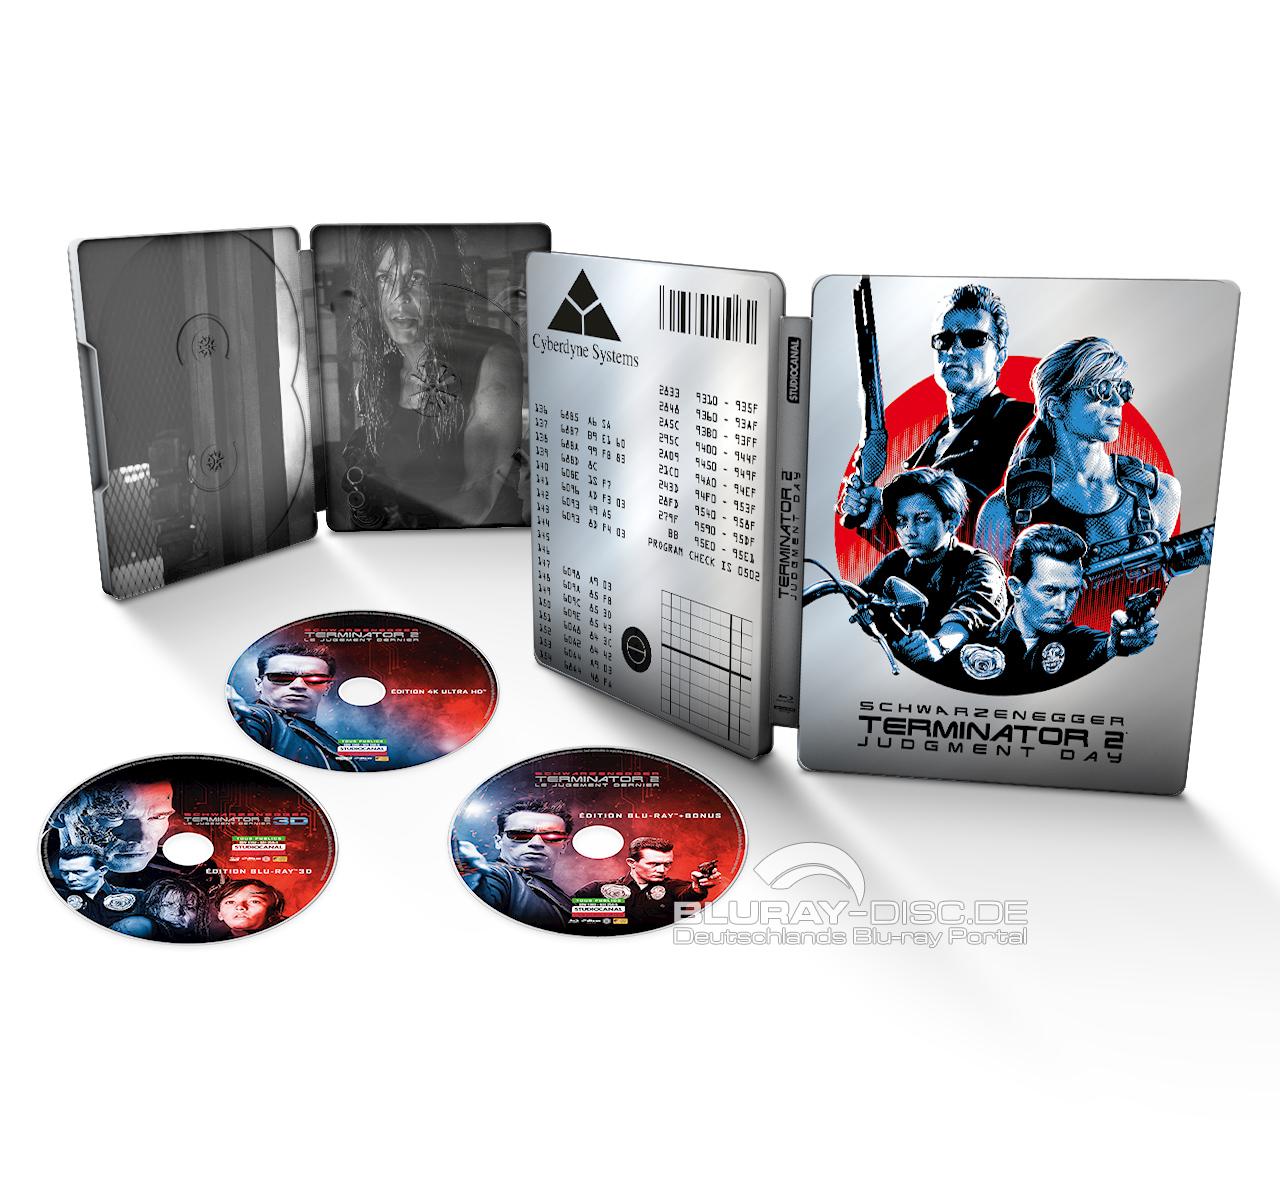 Terminator_2_Galerie_30th_Steelbook_Edition_01.jpg